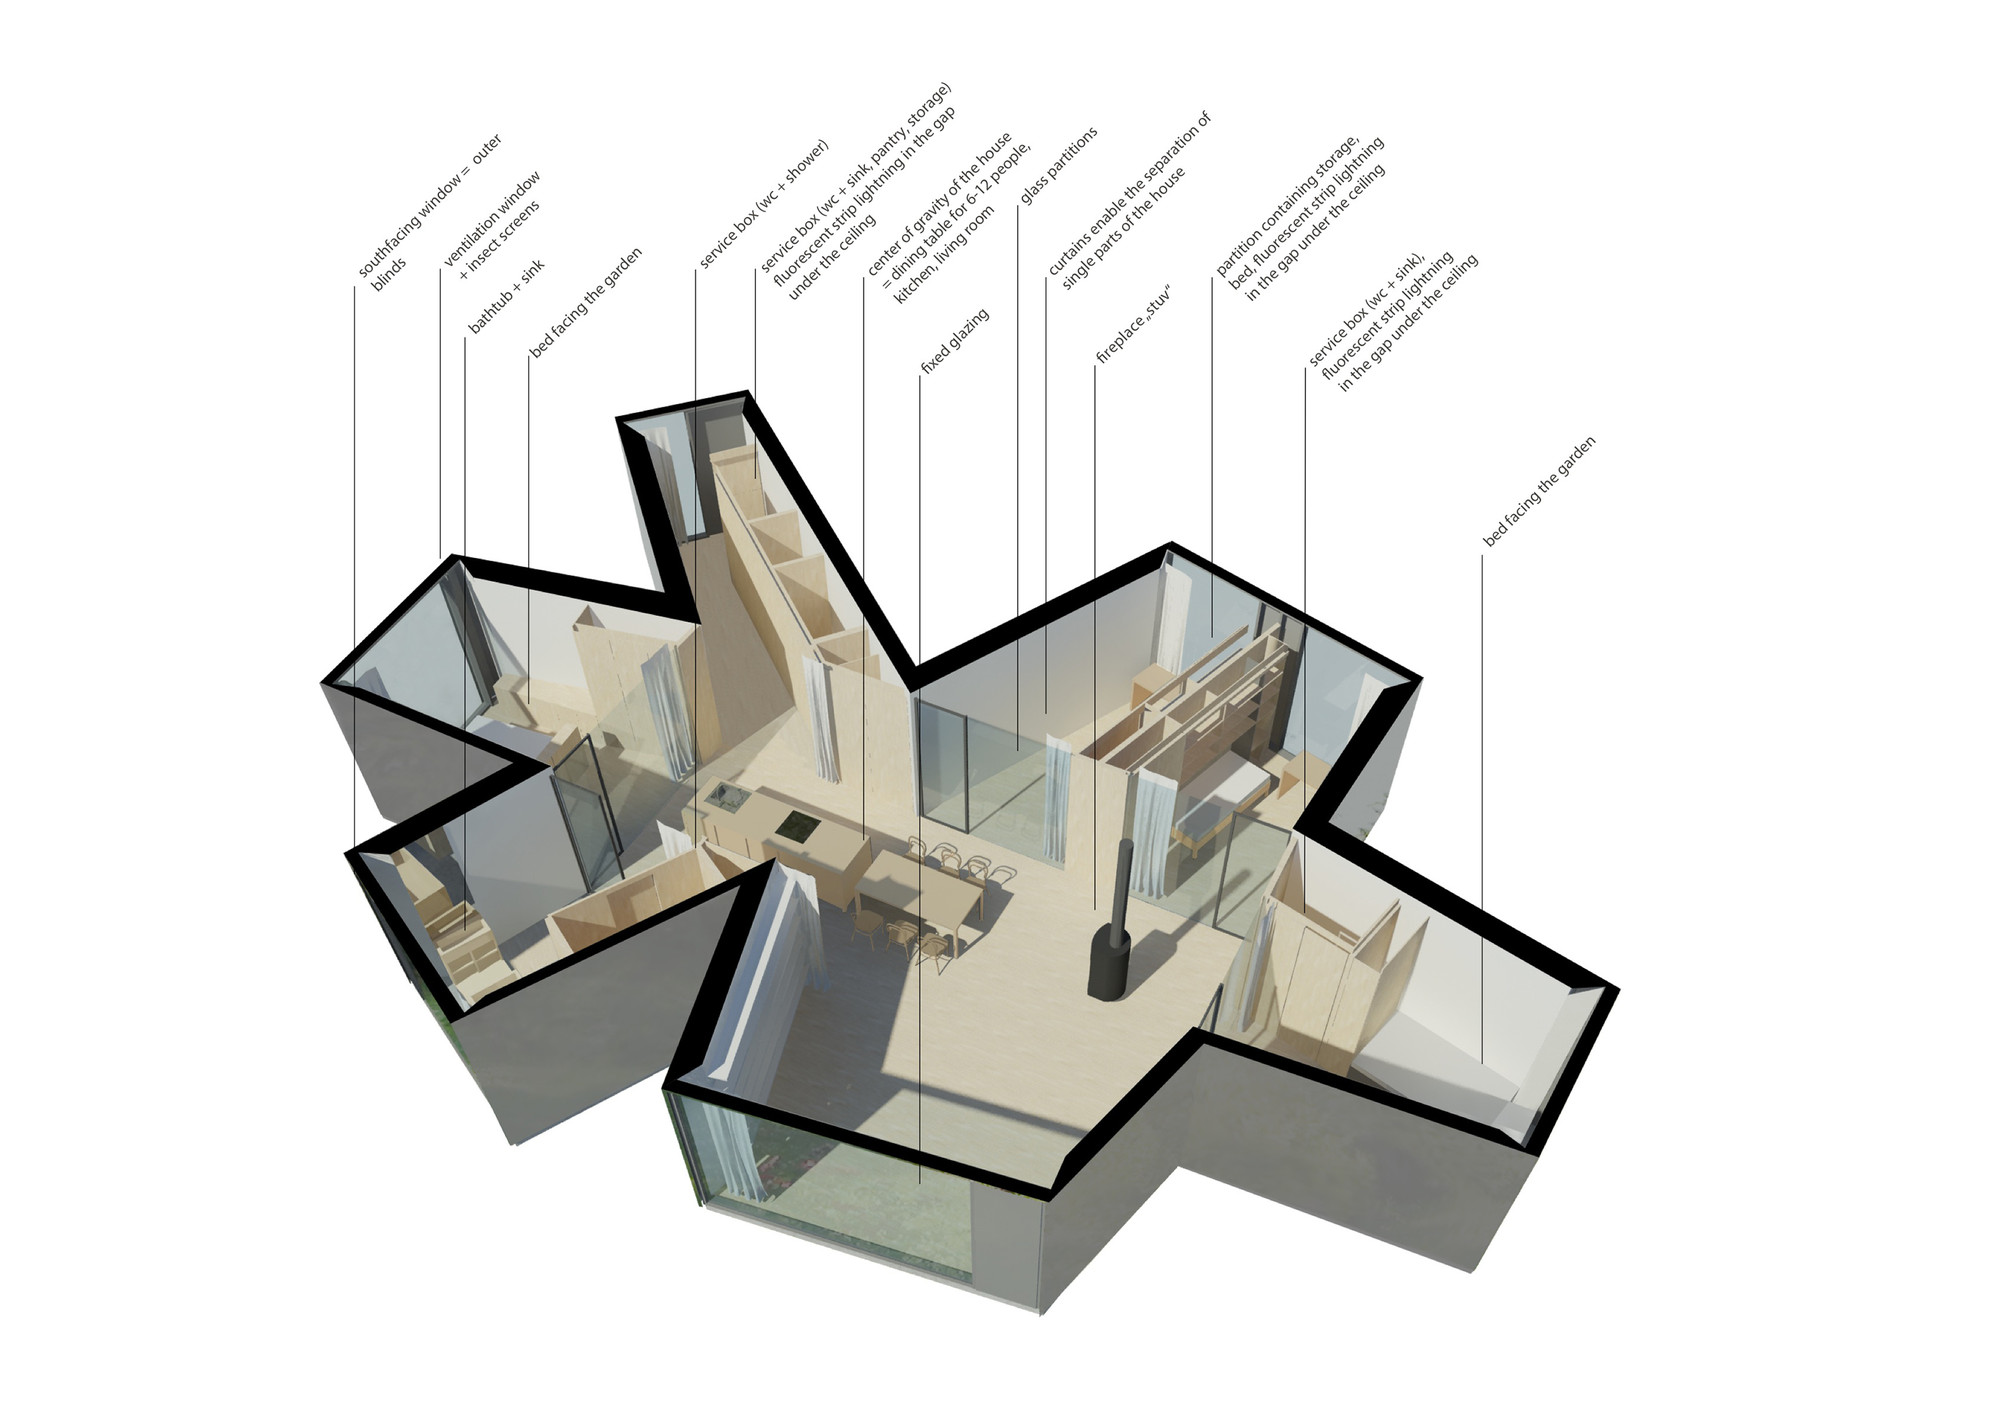 Gallery of Chameleon House / Petr Hajek Architekti - 15